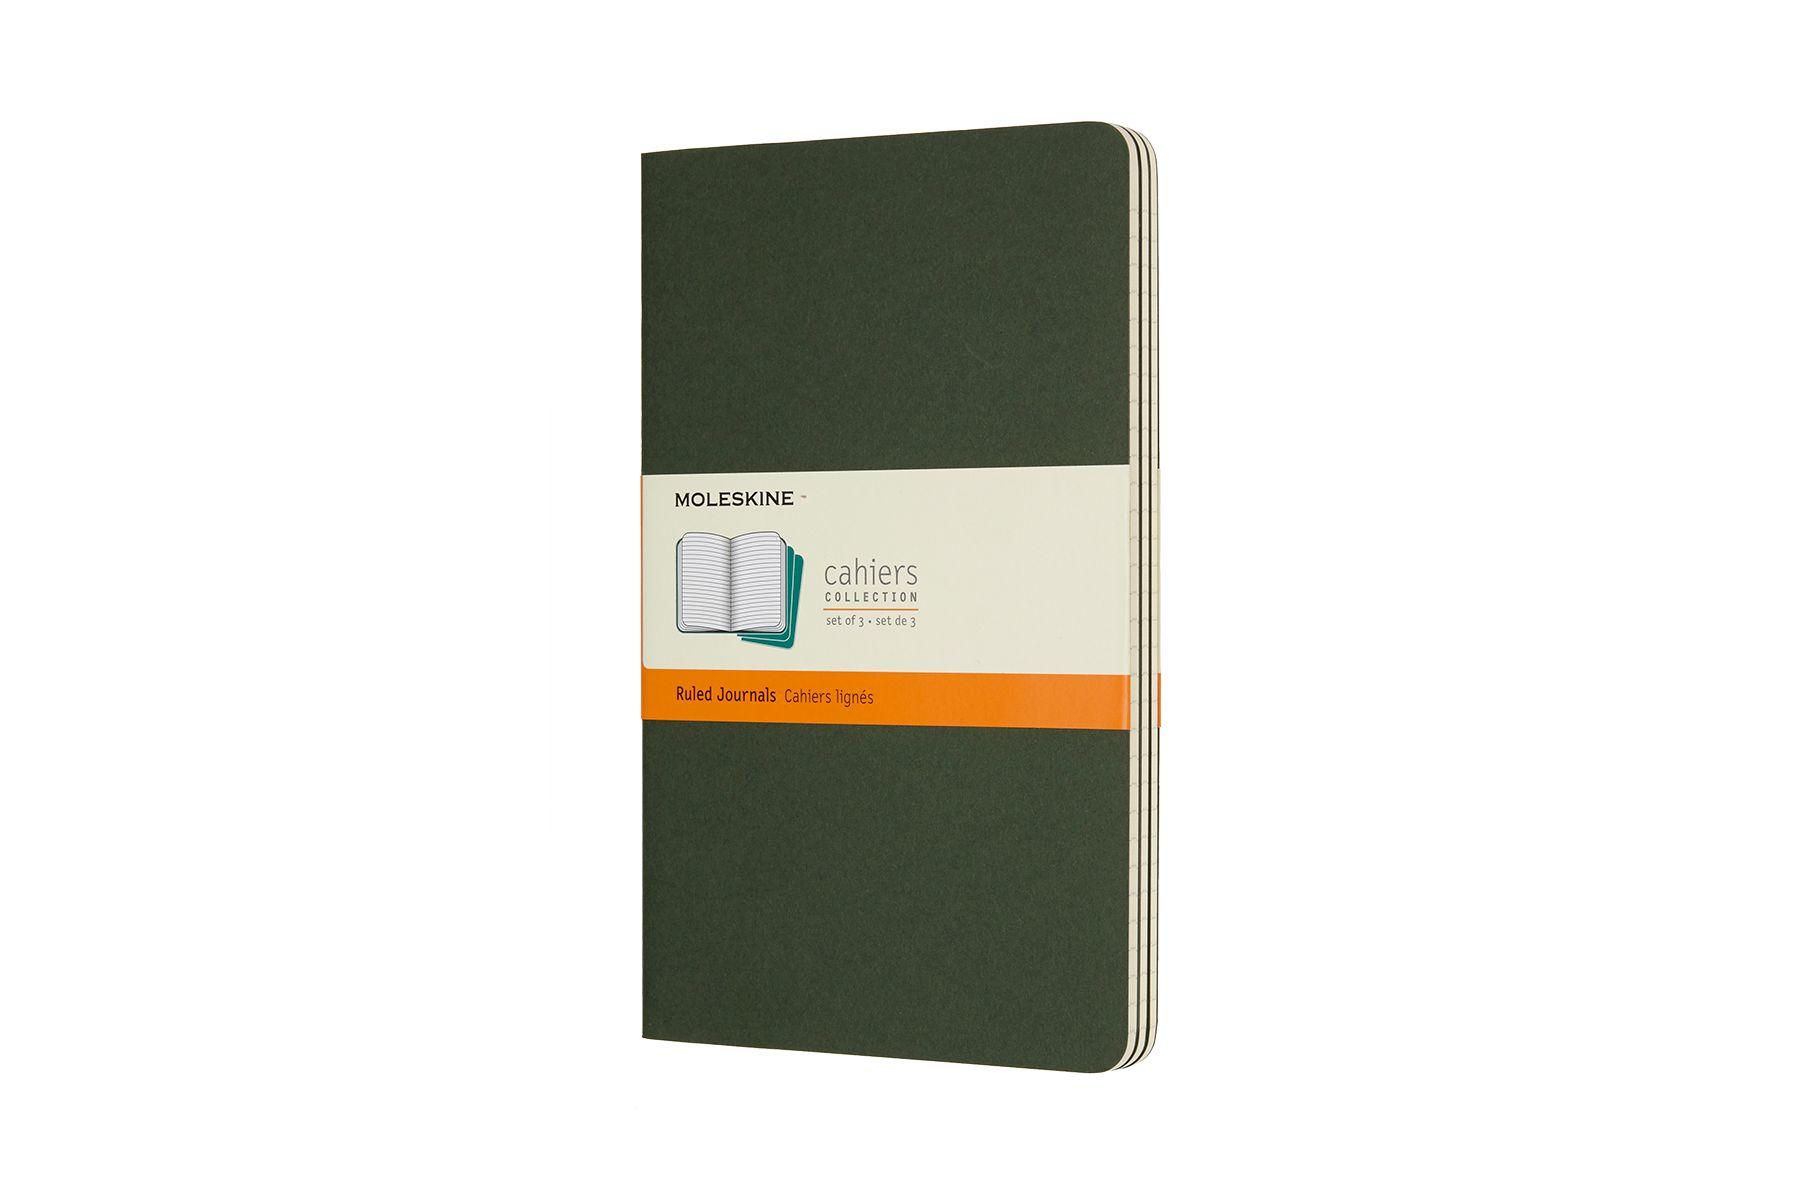 Moleskine Cahier Ruled Notebook Large Myrtle Green